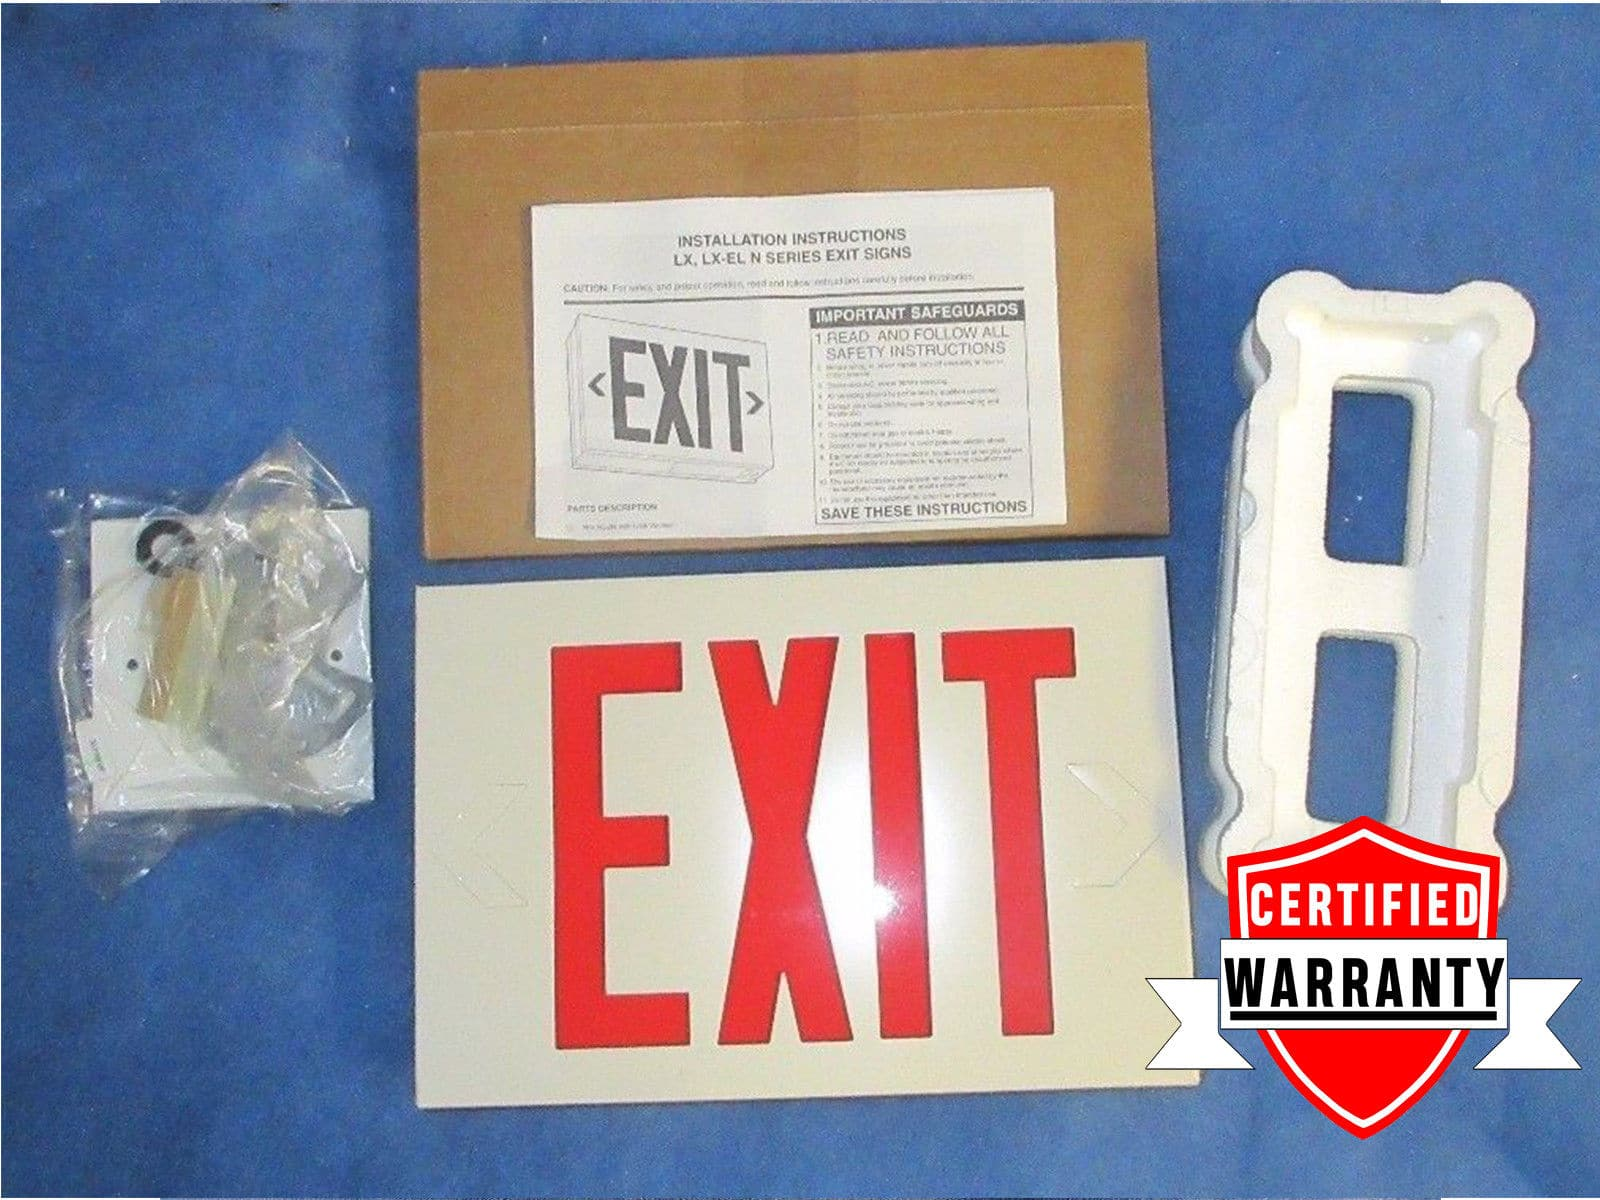 Nib Lithonia Lighting 120 277v Emergency Led Exit Sign Lx S W 3 R 2 Yr Warranty